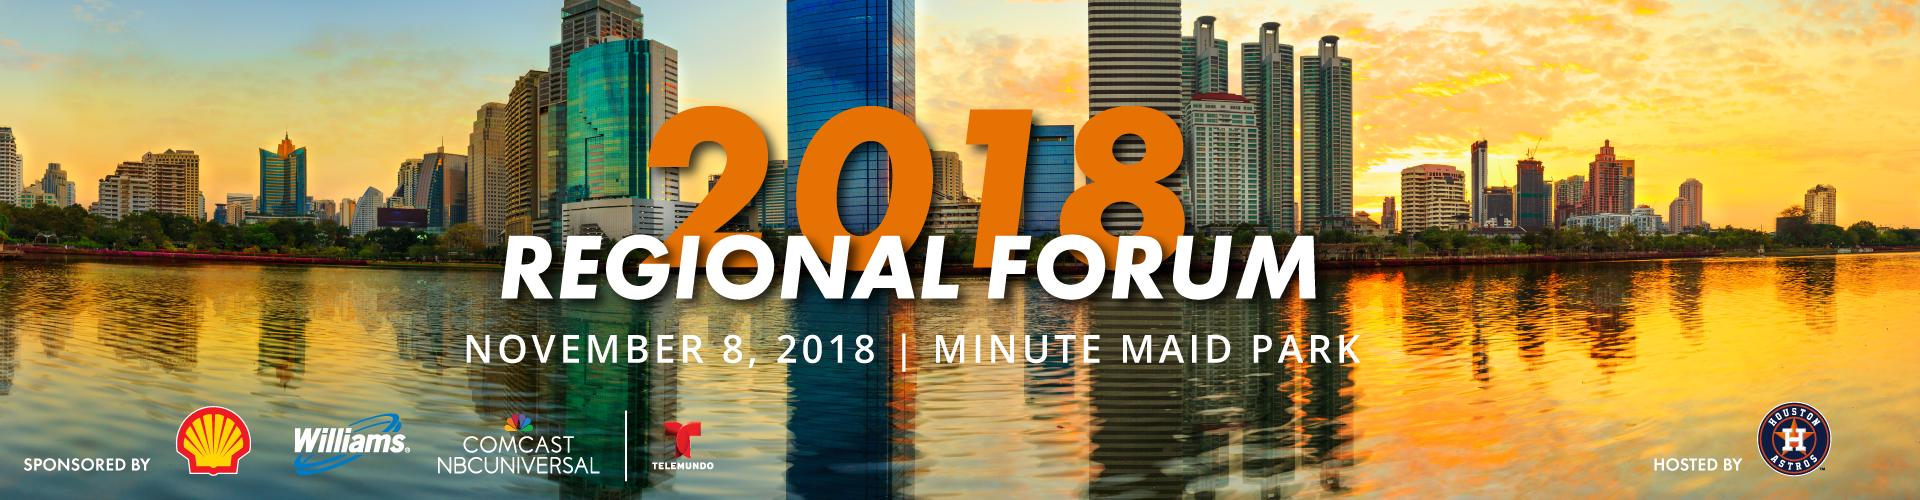 NHCC Regional Forum: 2018 Houston